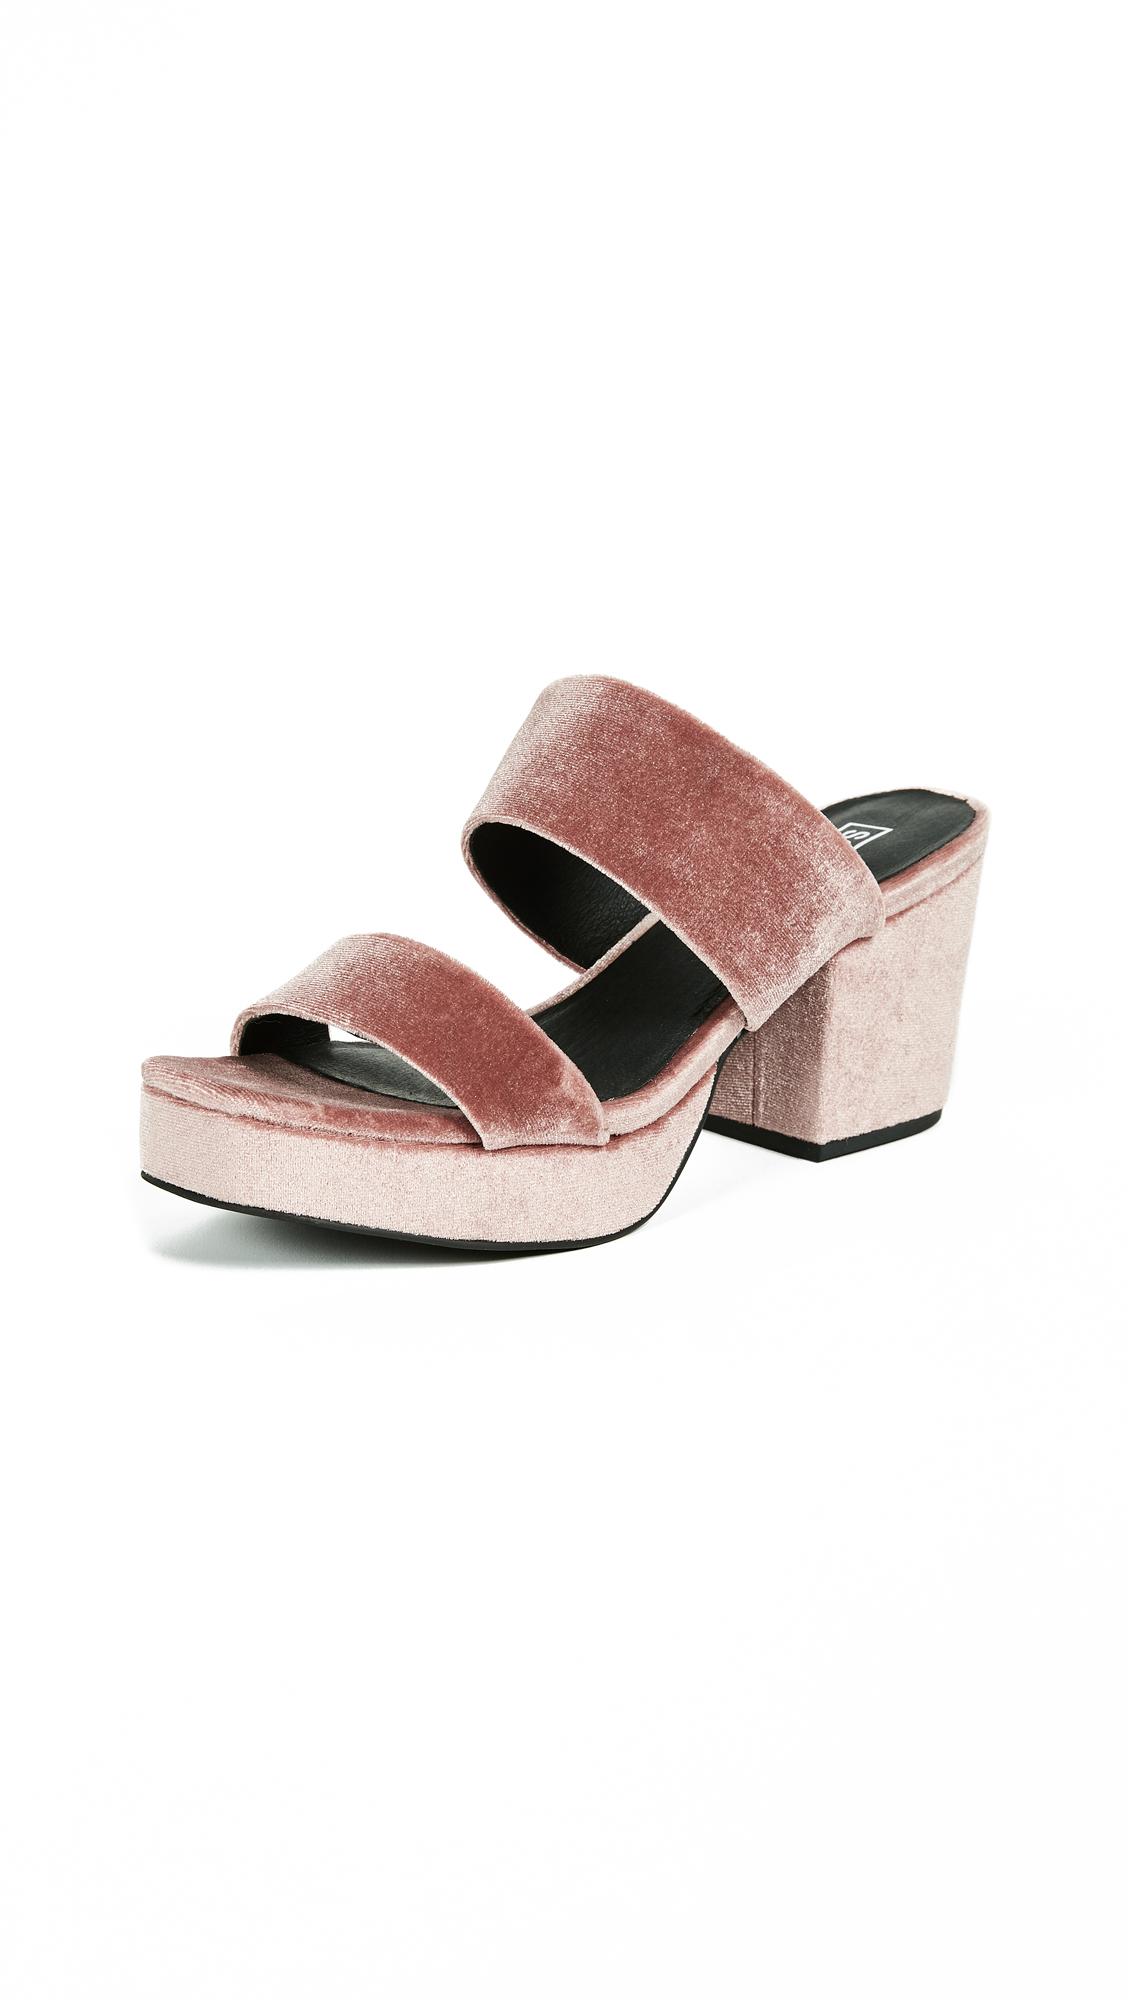 Sol Sana Tina Platform Sandals - Dusty Rose